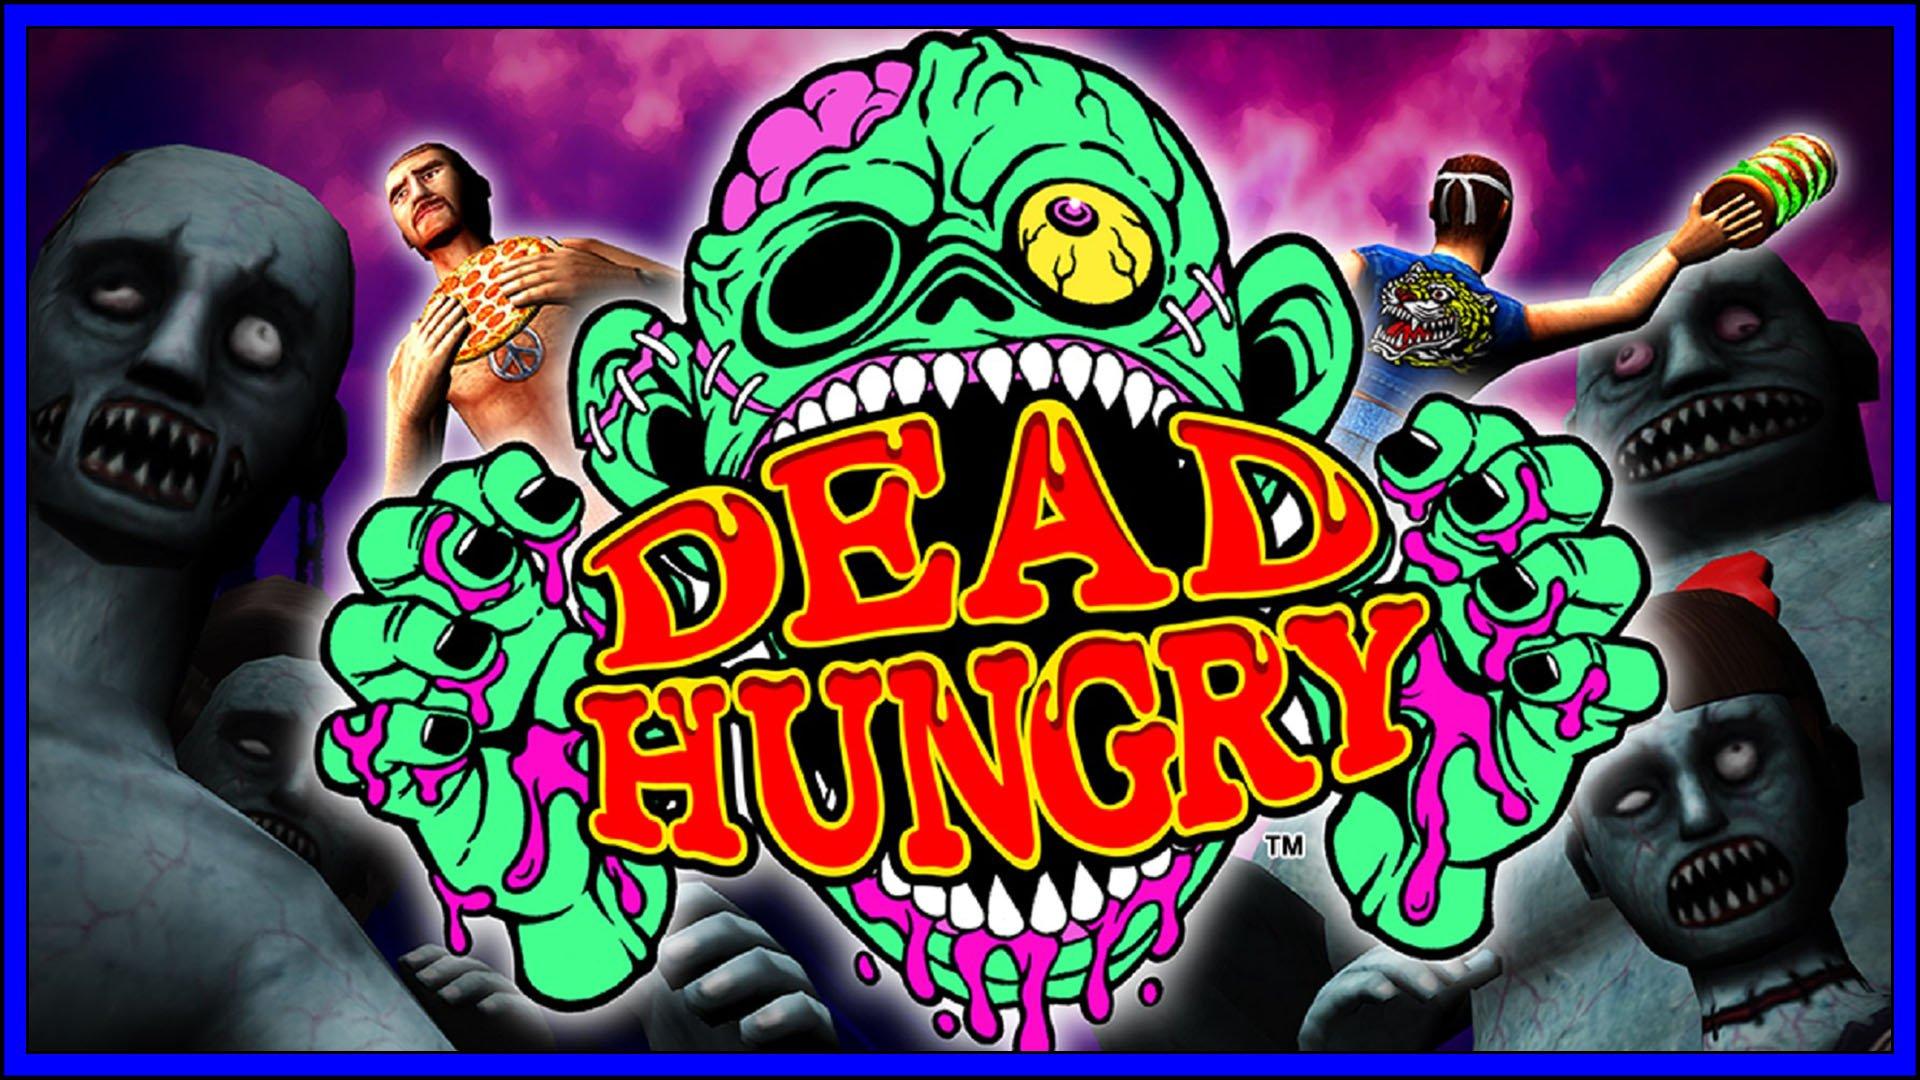 PixelJunk's Dead Hungry Fi3